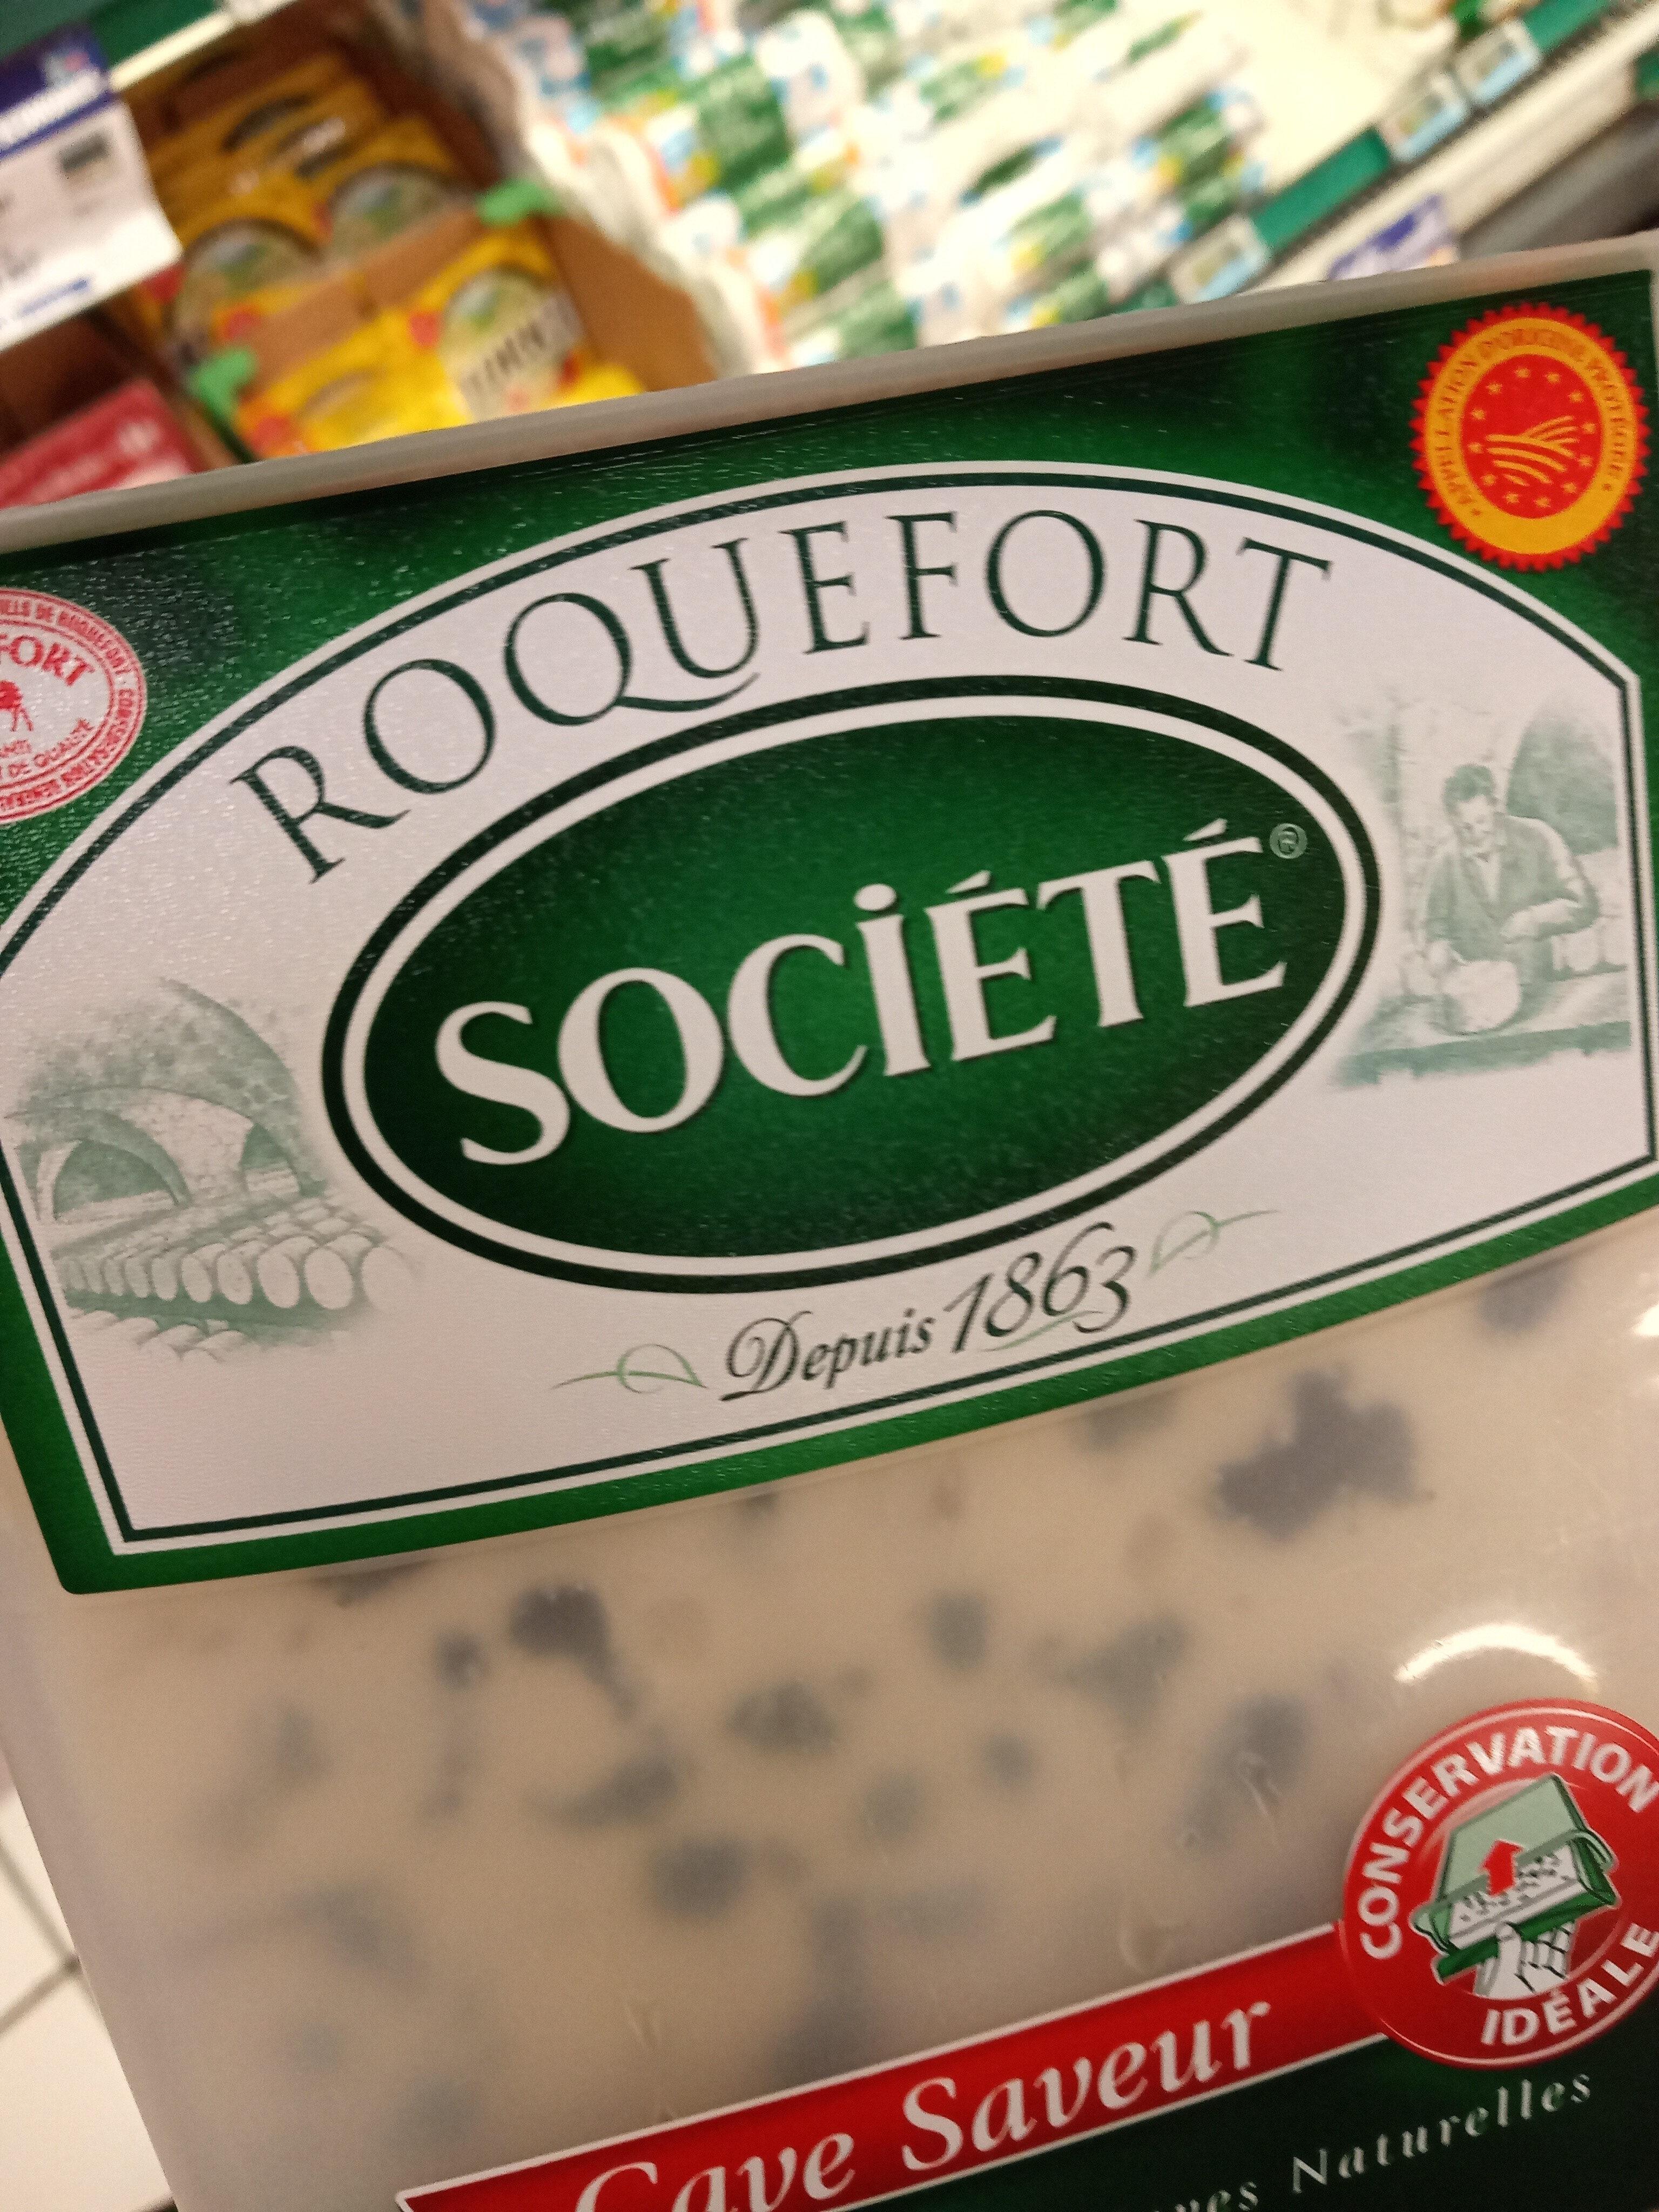 Roquefort Societe - Produit - fr